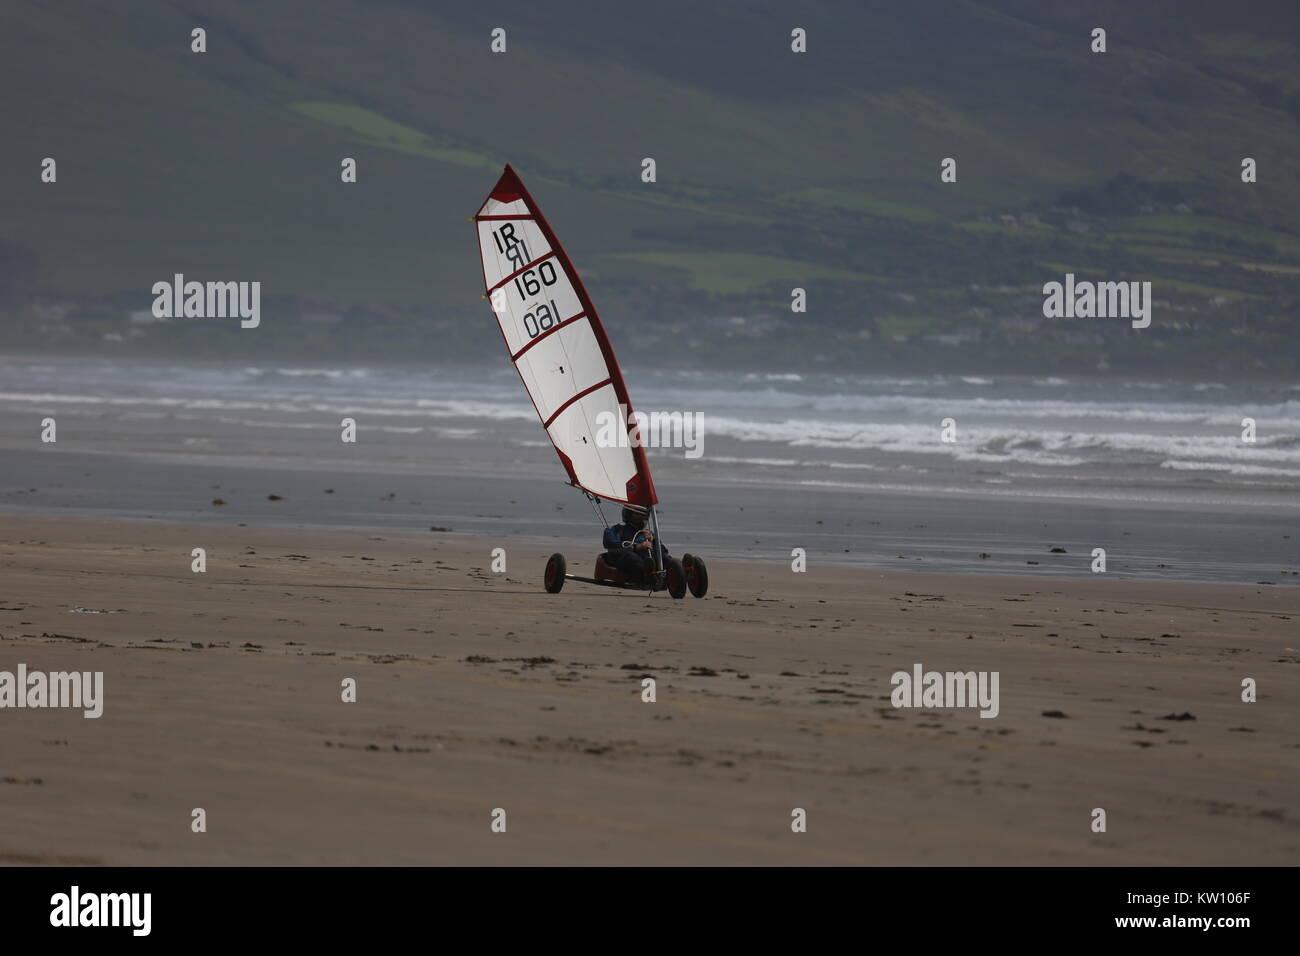 Beach surfing on a beach in Ireland - Stock Image